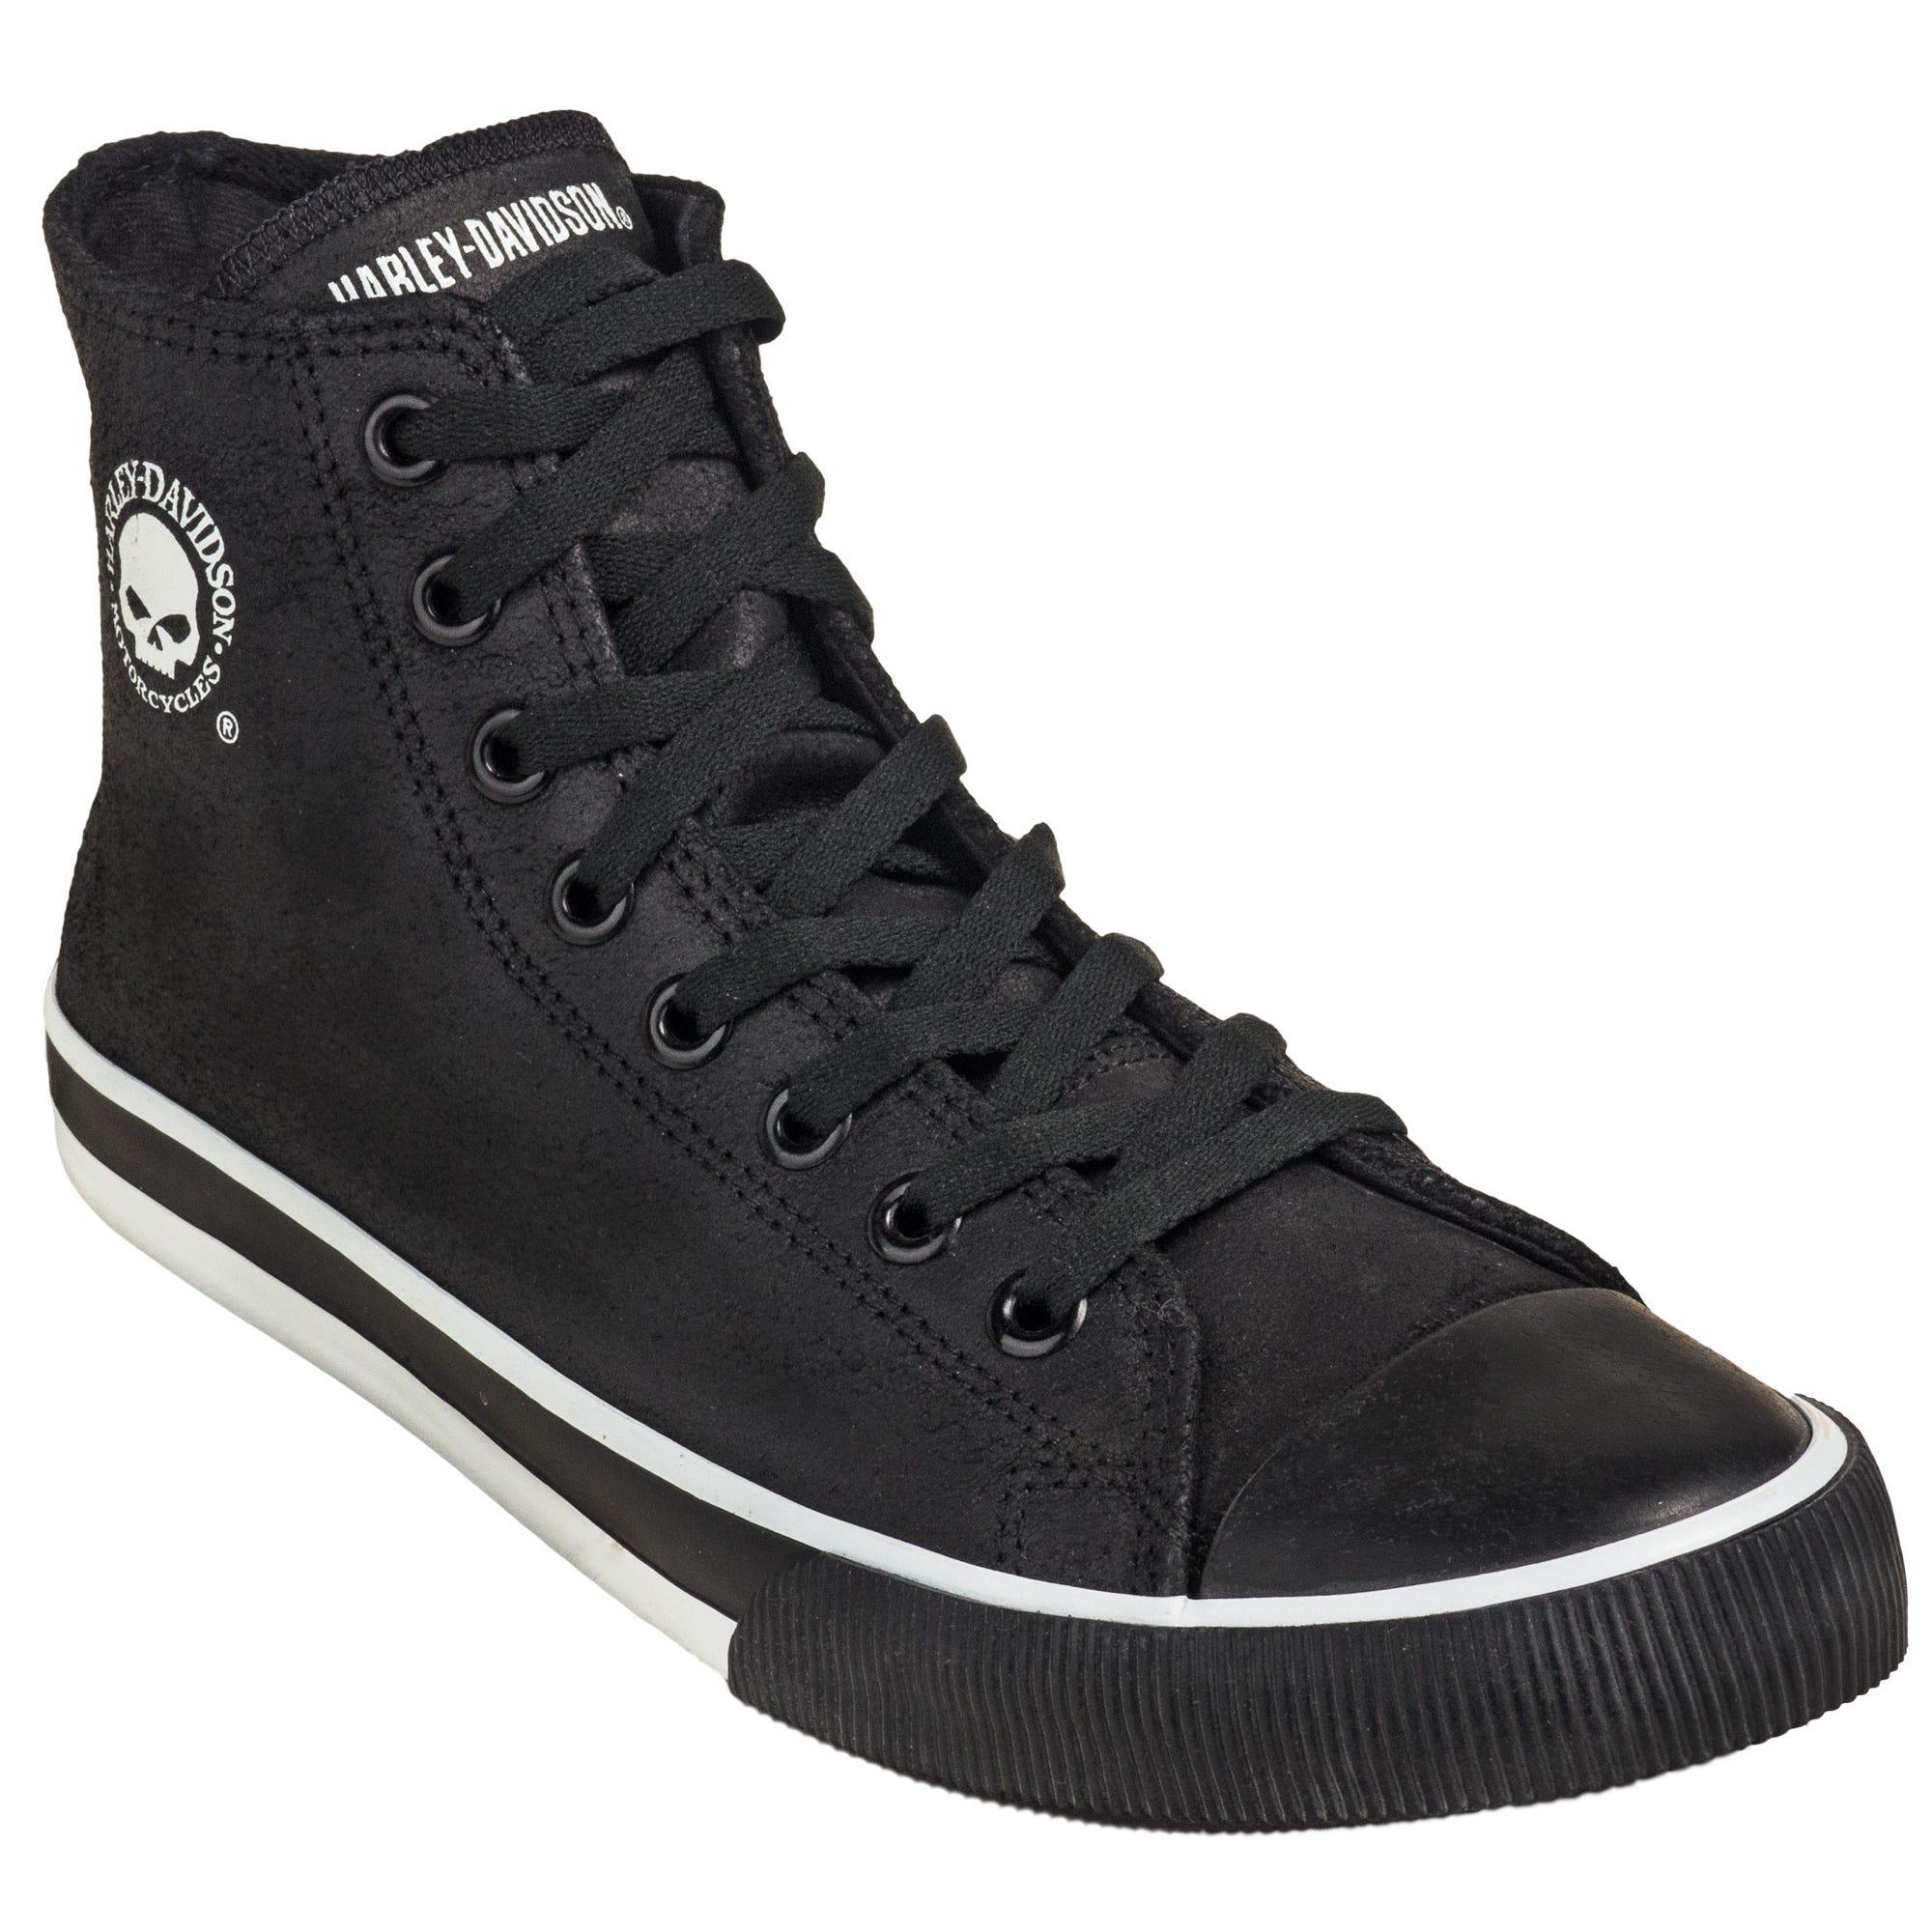 Harley Davidson Baxter Men's Black/White D93341 High-Cut Sneakers